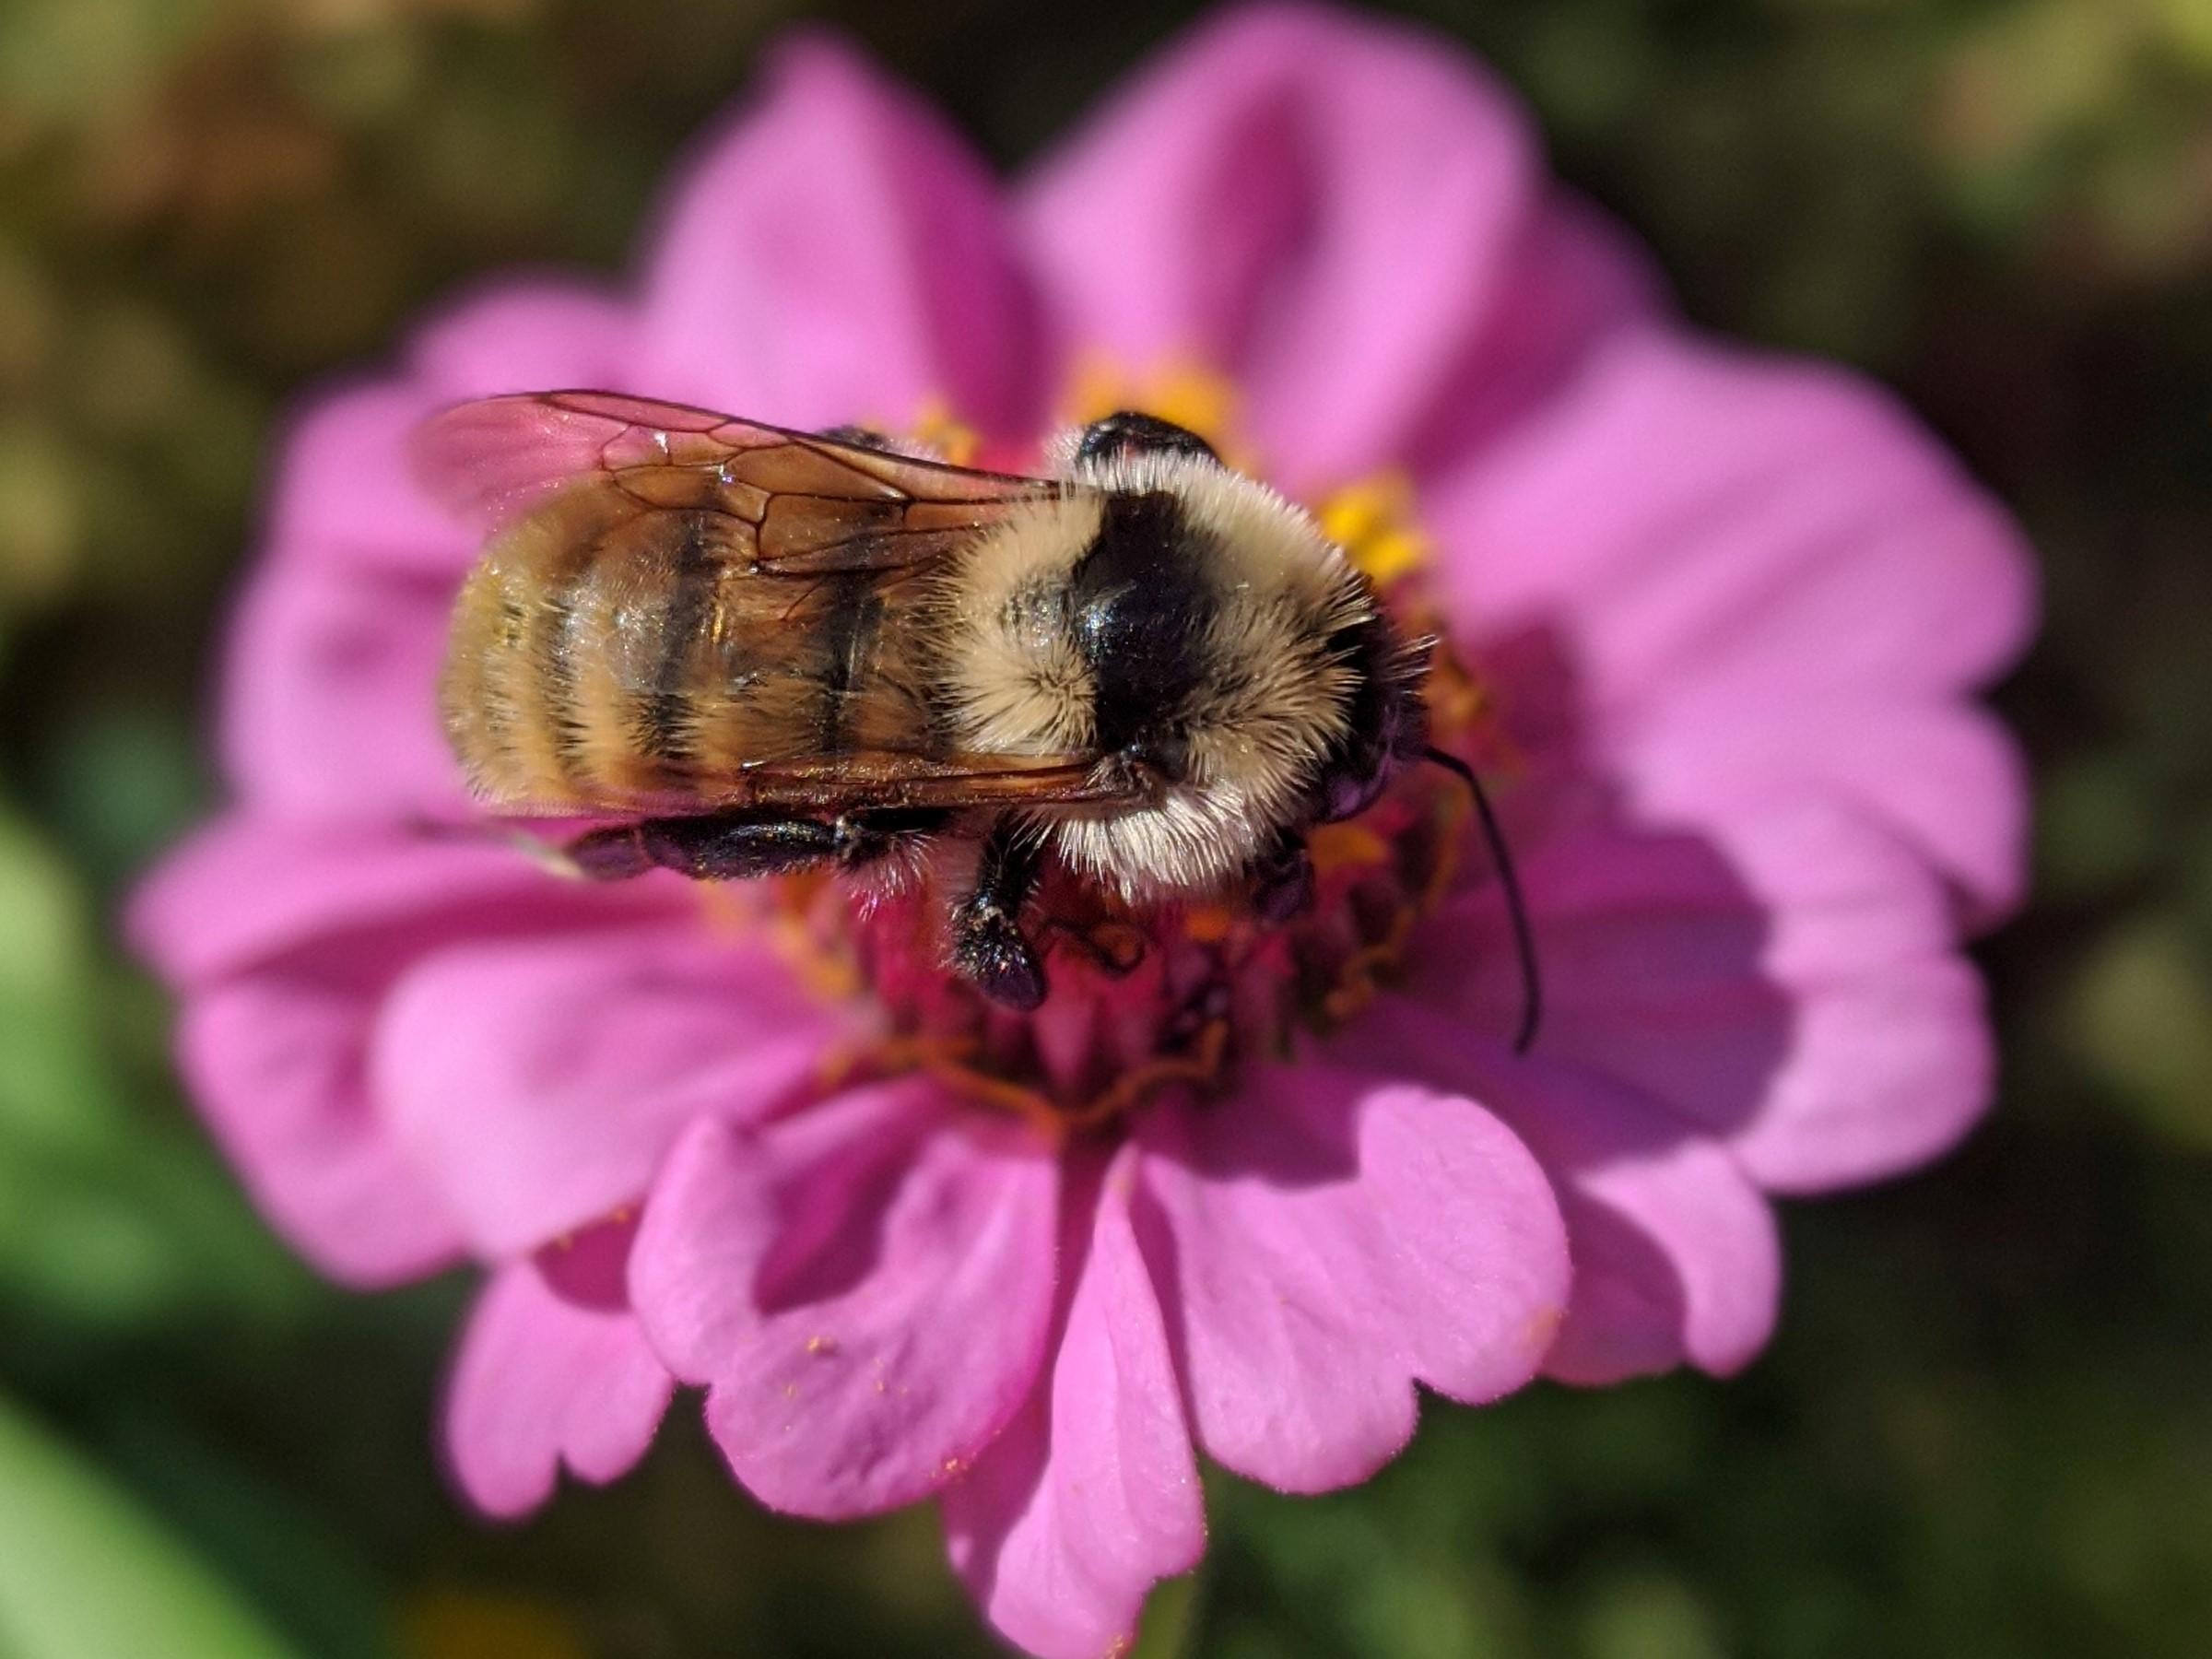 A single bumblebee sits on a purple zinnia flower in a garden.